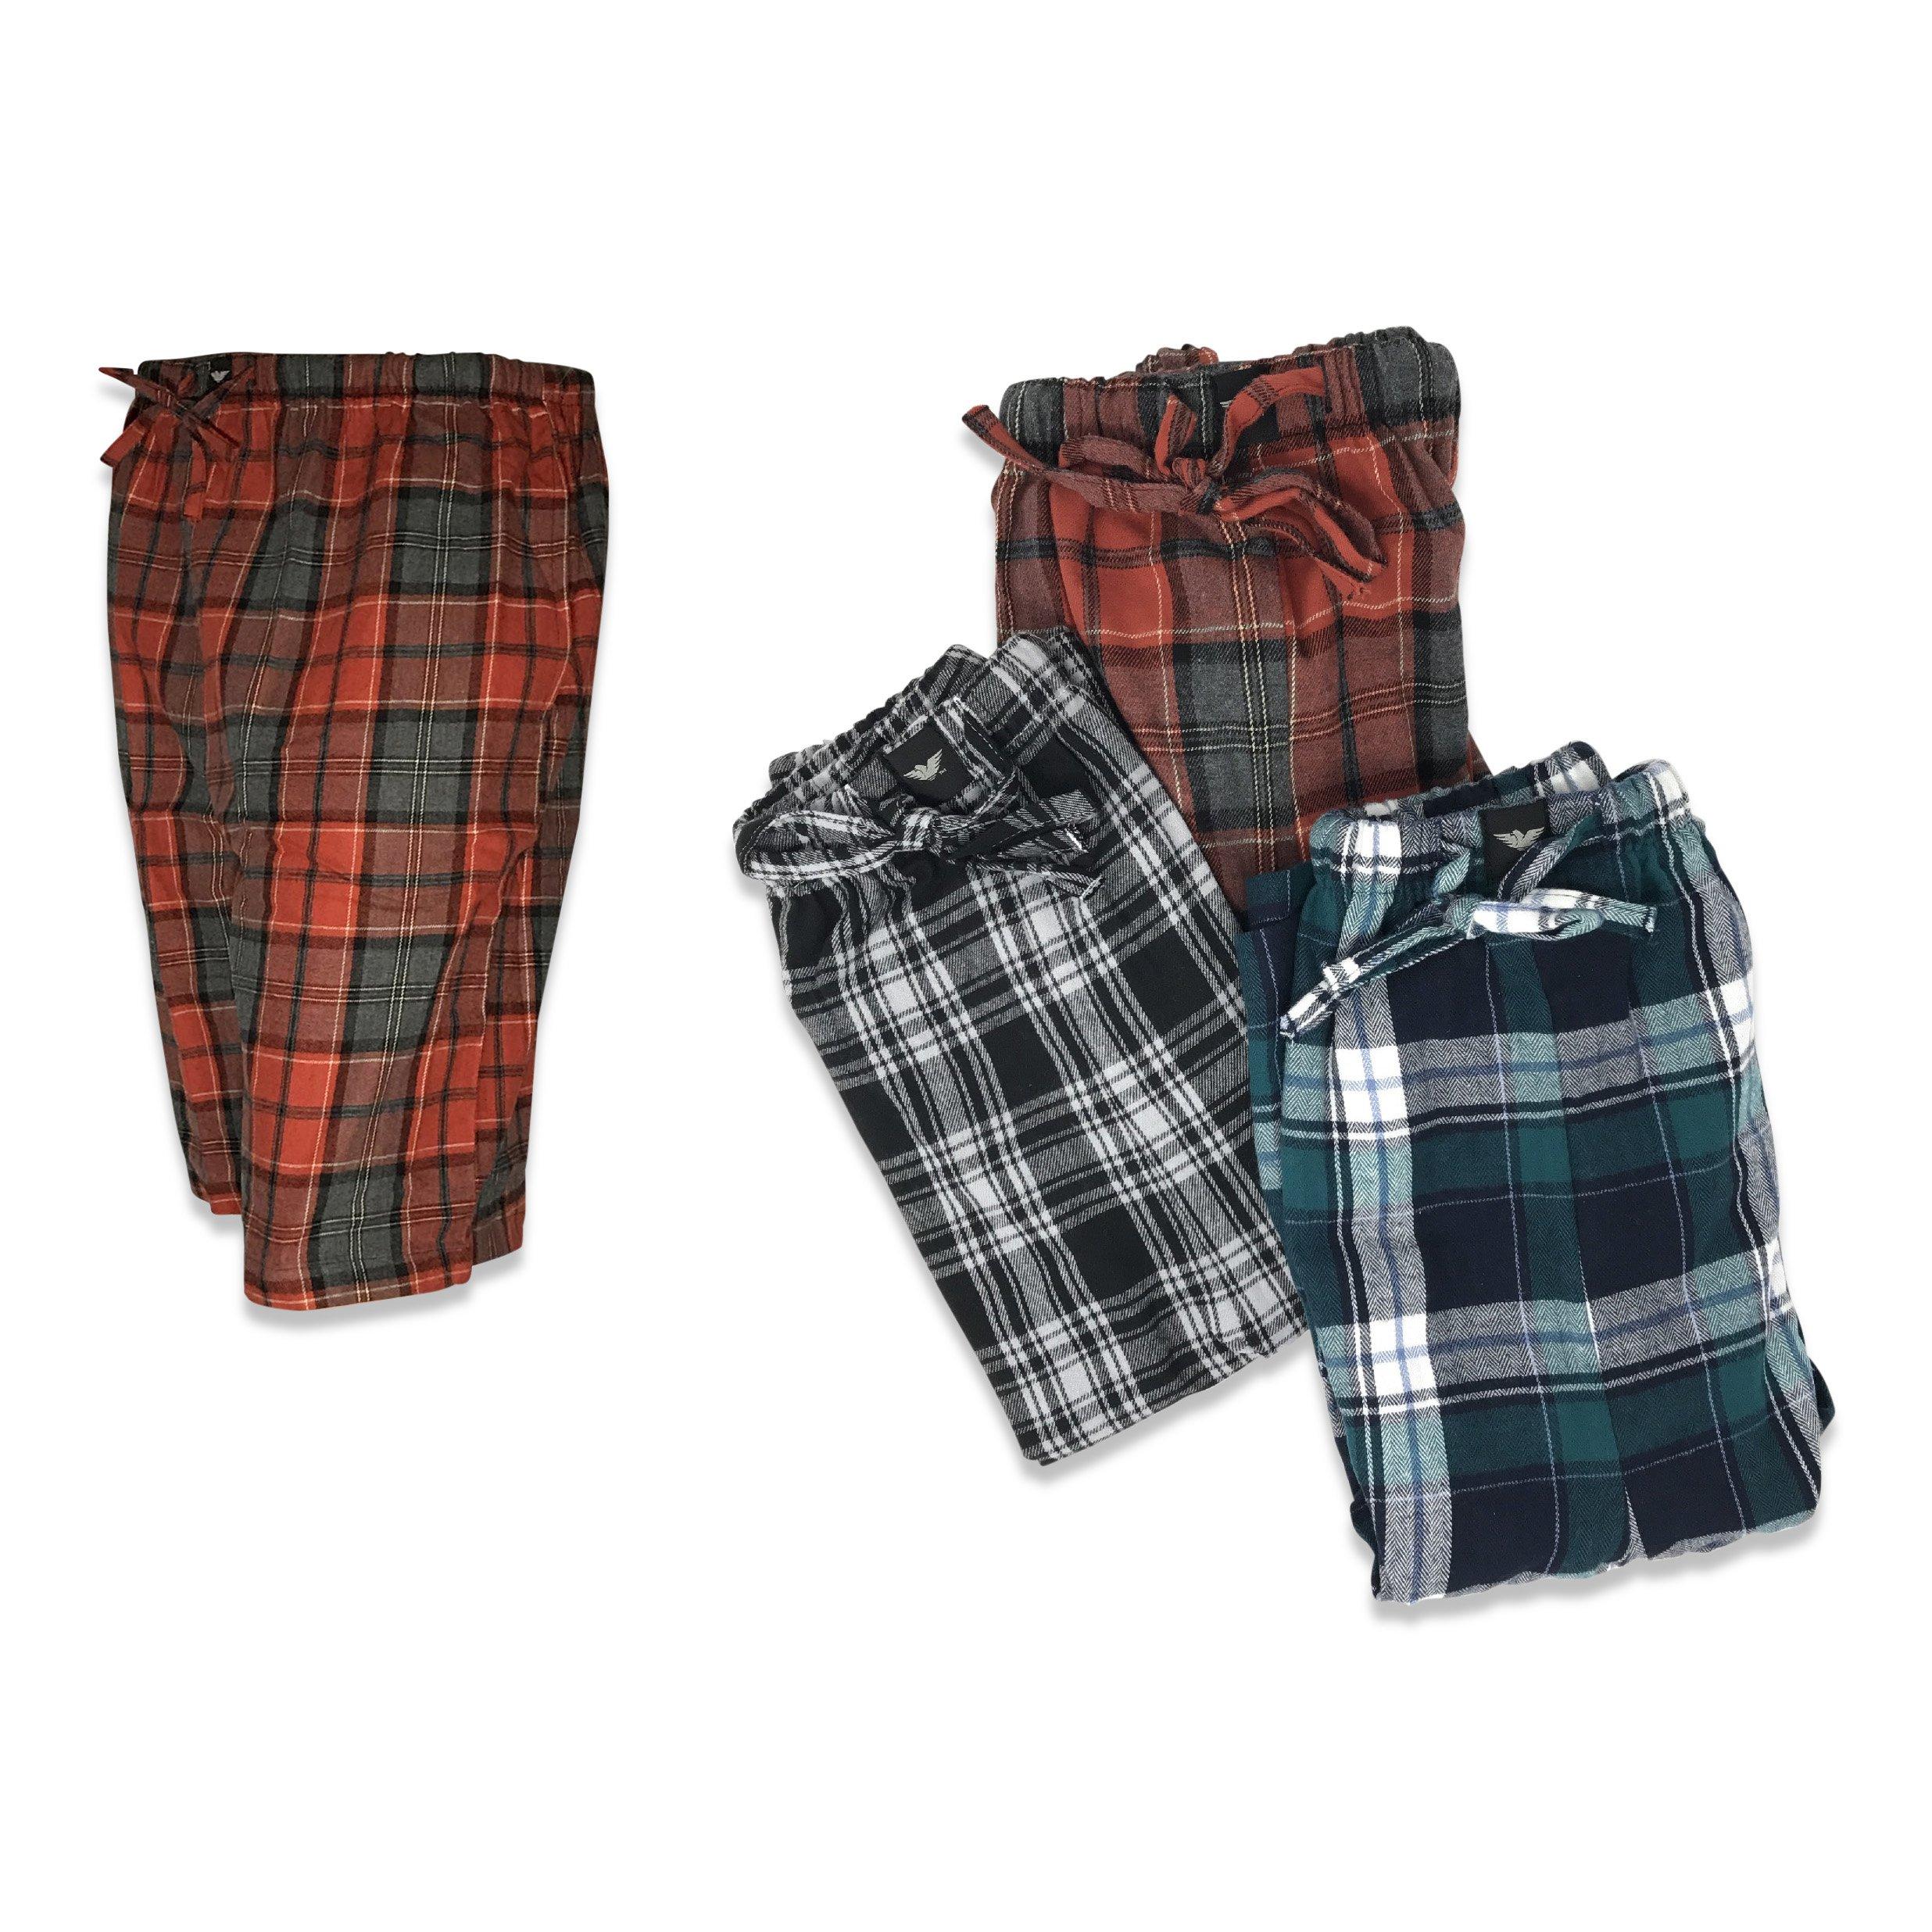 American Active 24/7 Basics Men's 3 Pack Cotton Soft Sleep Lounge Pant Jam Cargo Shorts (4XL, 3 Pack - Plaid Assortment)